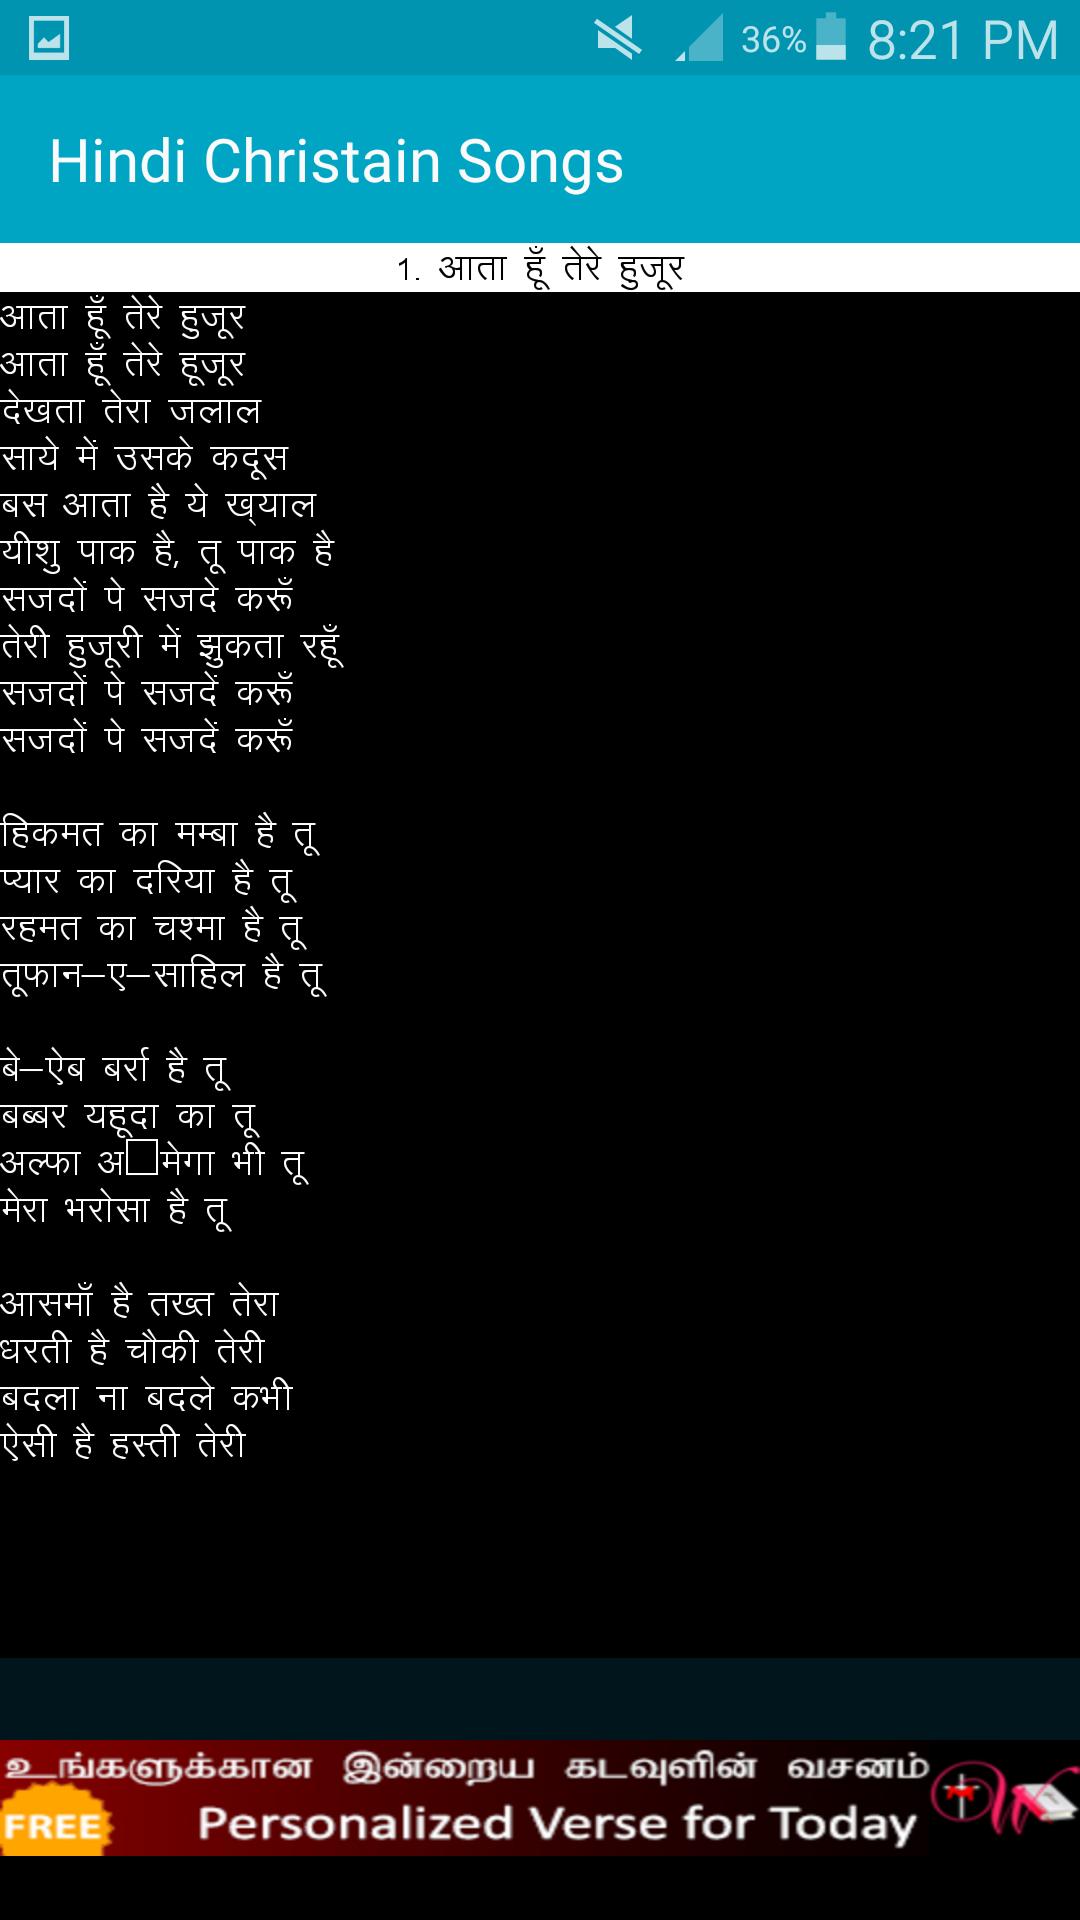 Amazon Com Hindi Christian Song Book Appstore For Android Dhanyawad ke saath live song by iyob mavchi    spiritual revival festival vadibhensrot gujarat. amazon com hindi christian song book